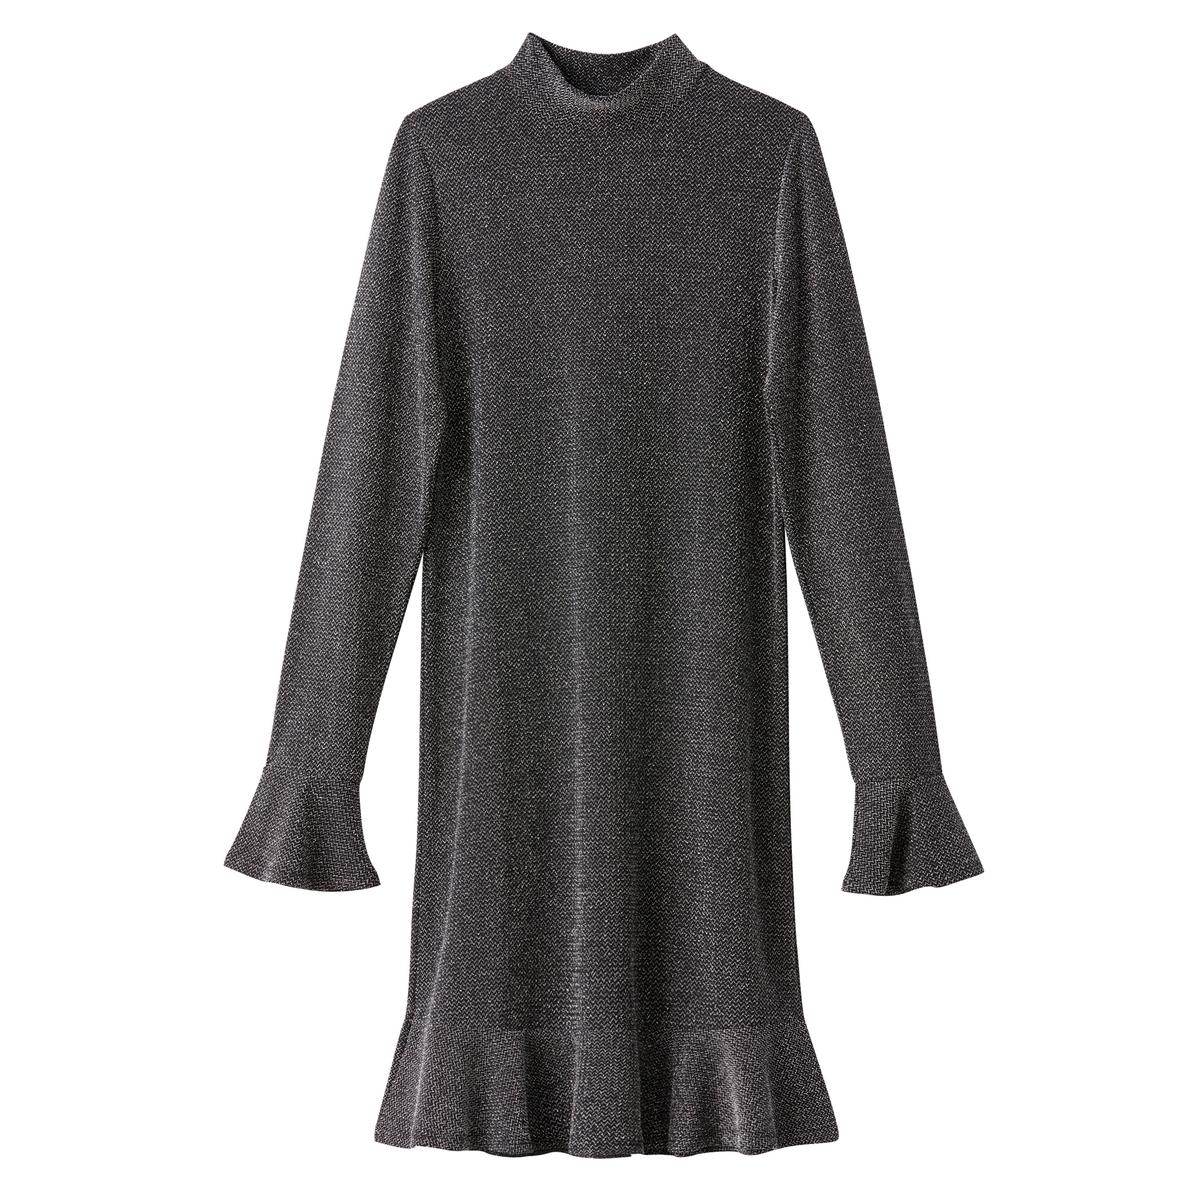 Платье из трикотажа с металлическим отливом